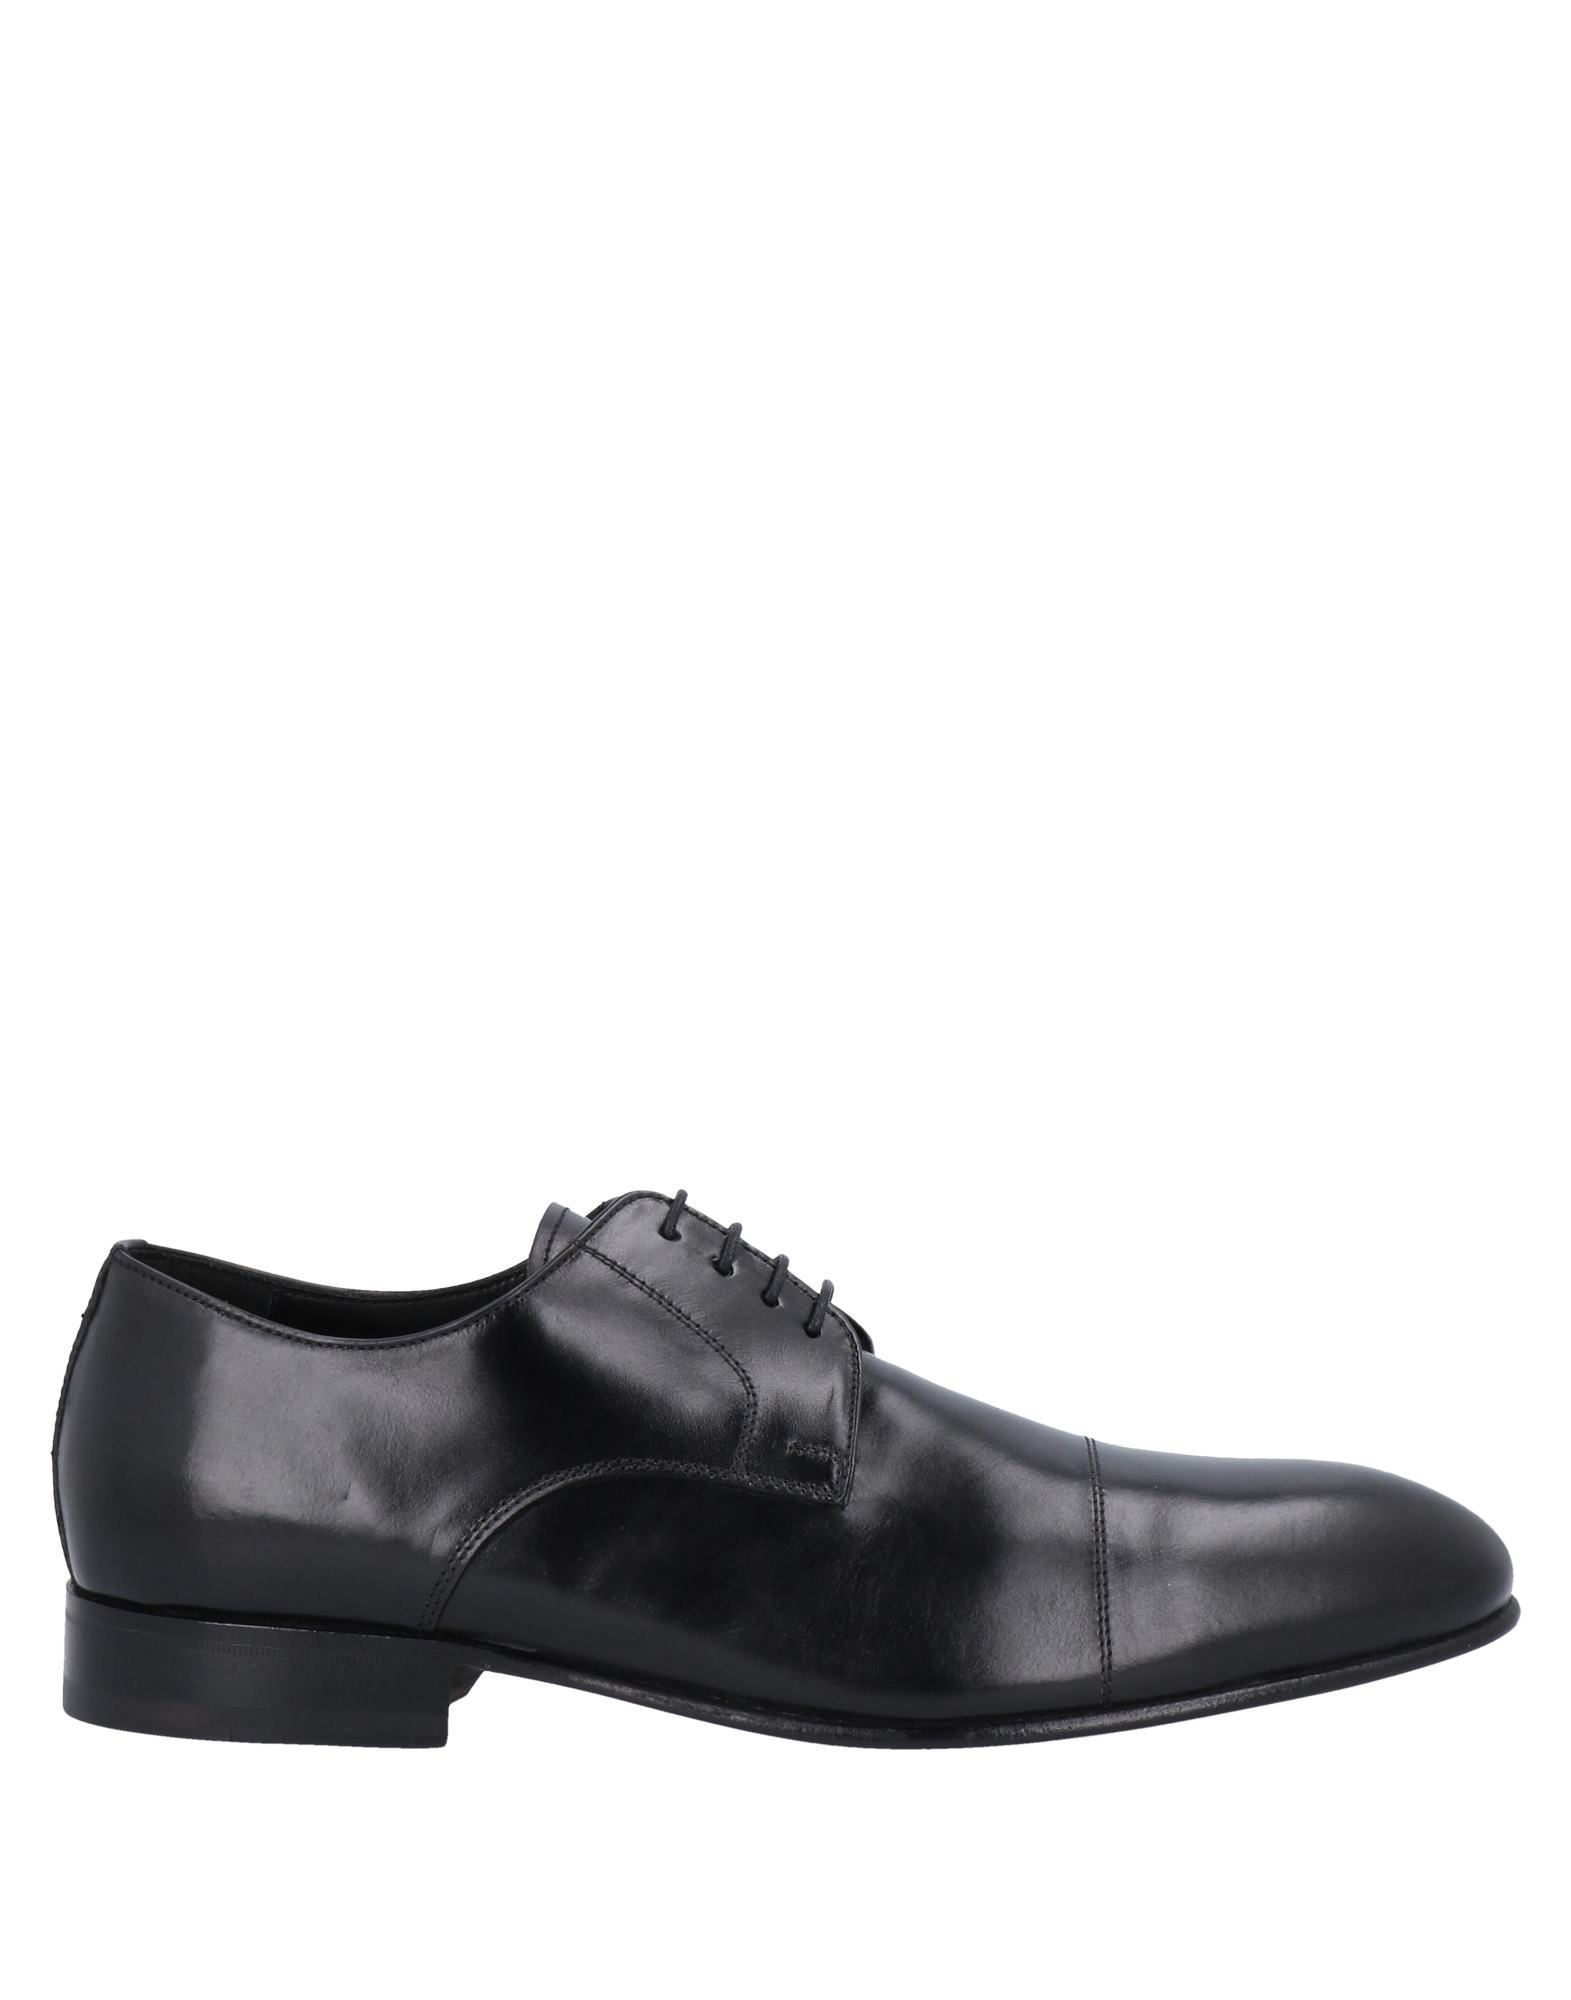 F.LLI FERRARI Обувь на шнурках f lli ferrari обувь на шнурках